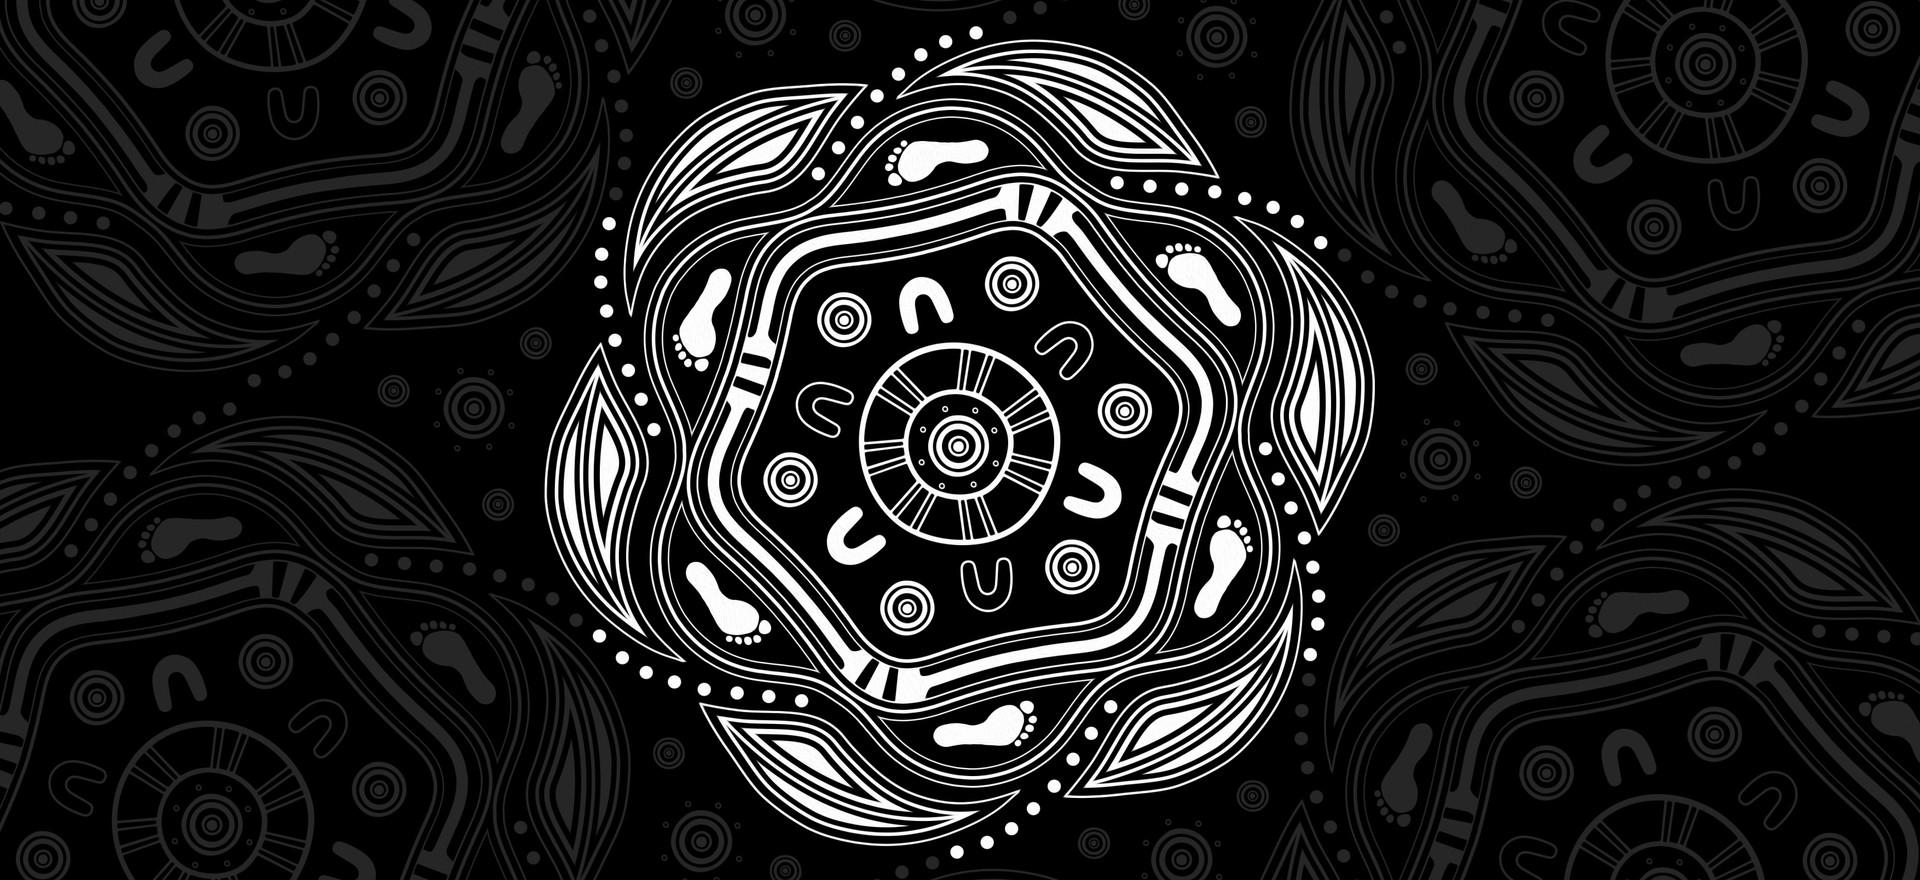 RMIT - RAP Artwork